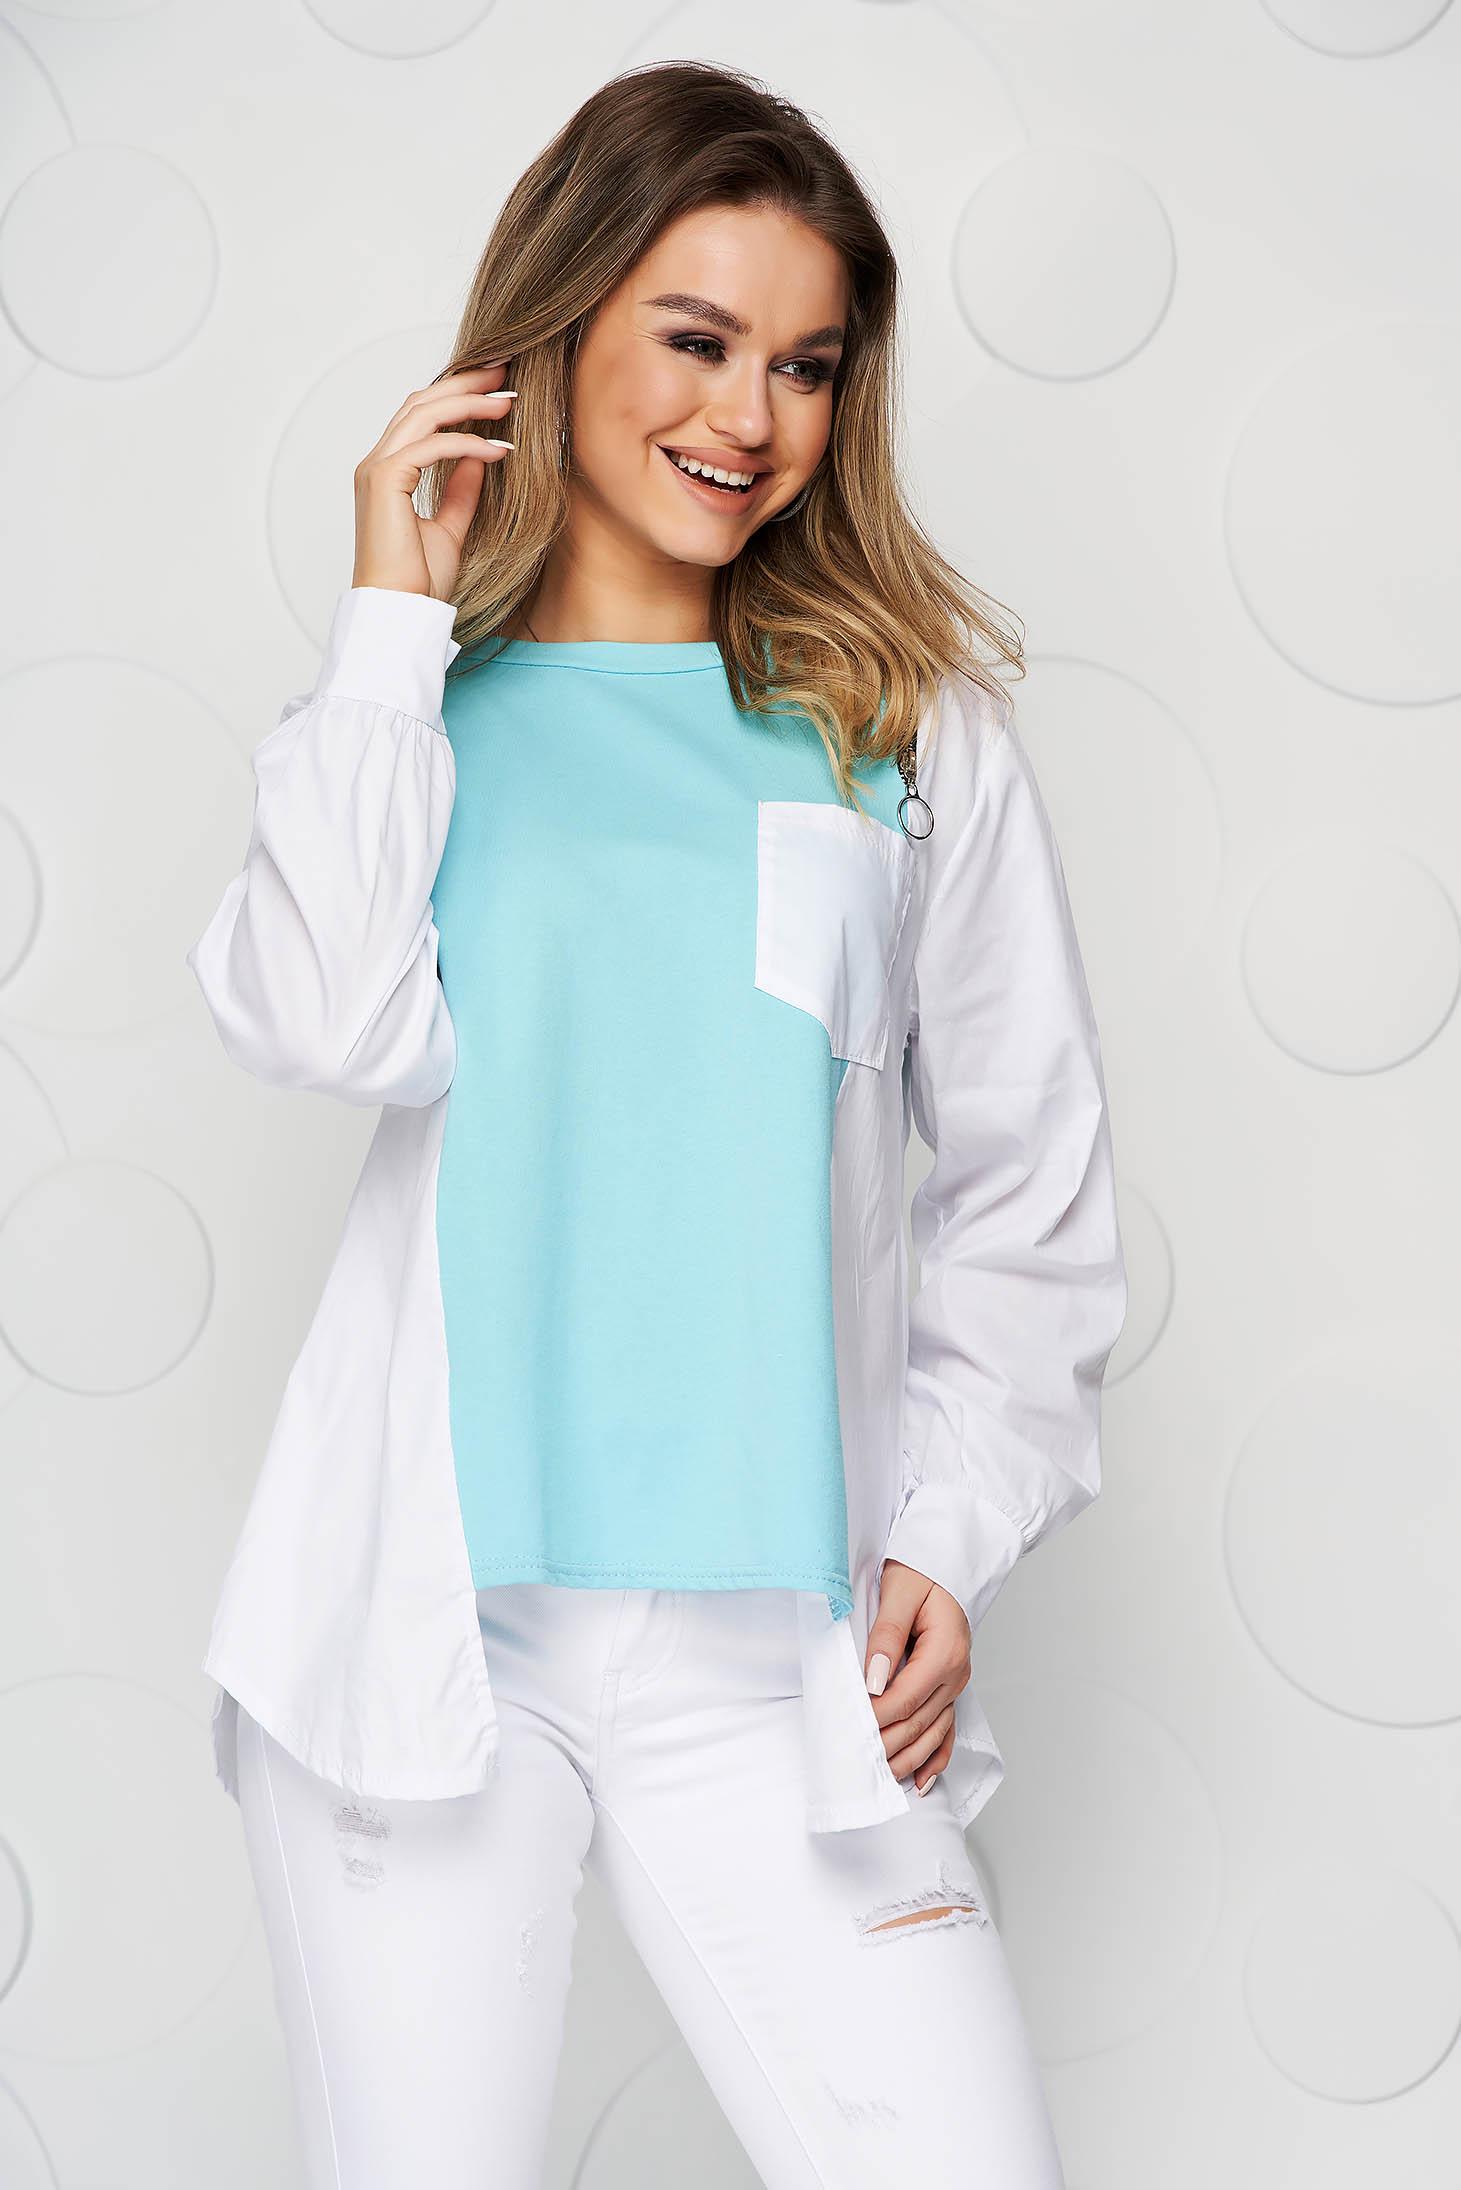 Turquoise women`s blouse cotton asymmetrical loose fit zipper accessory